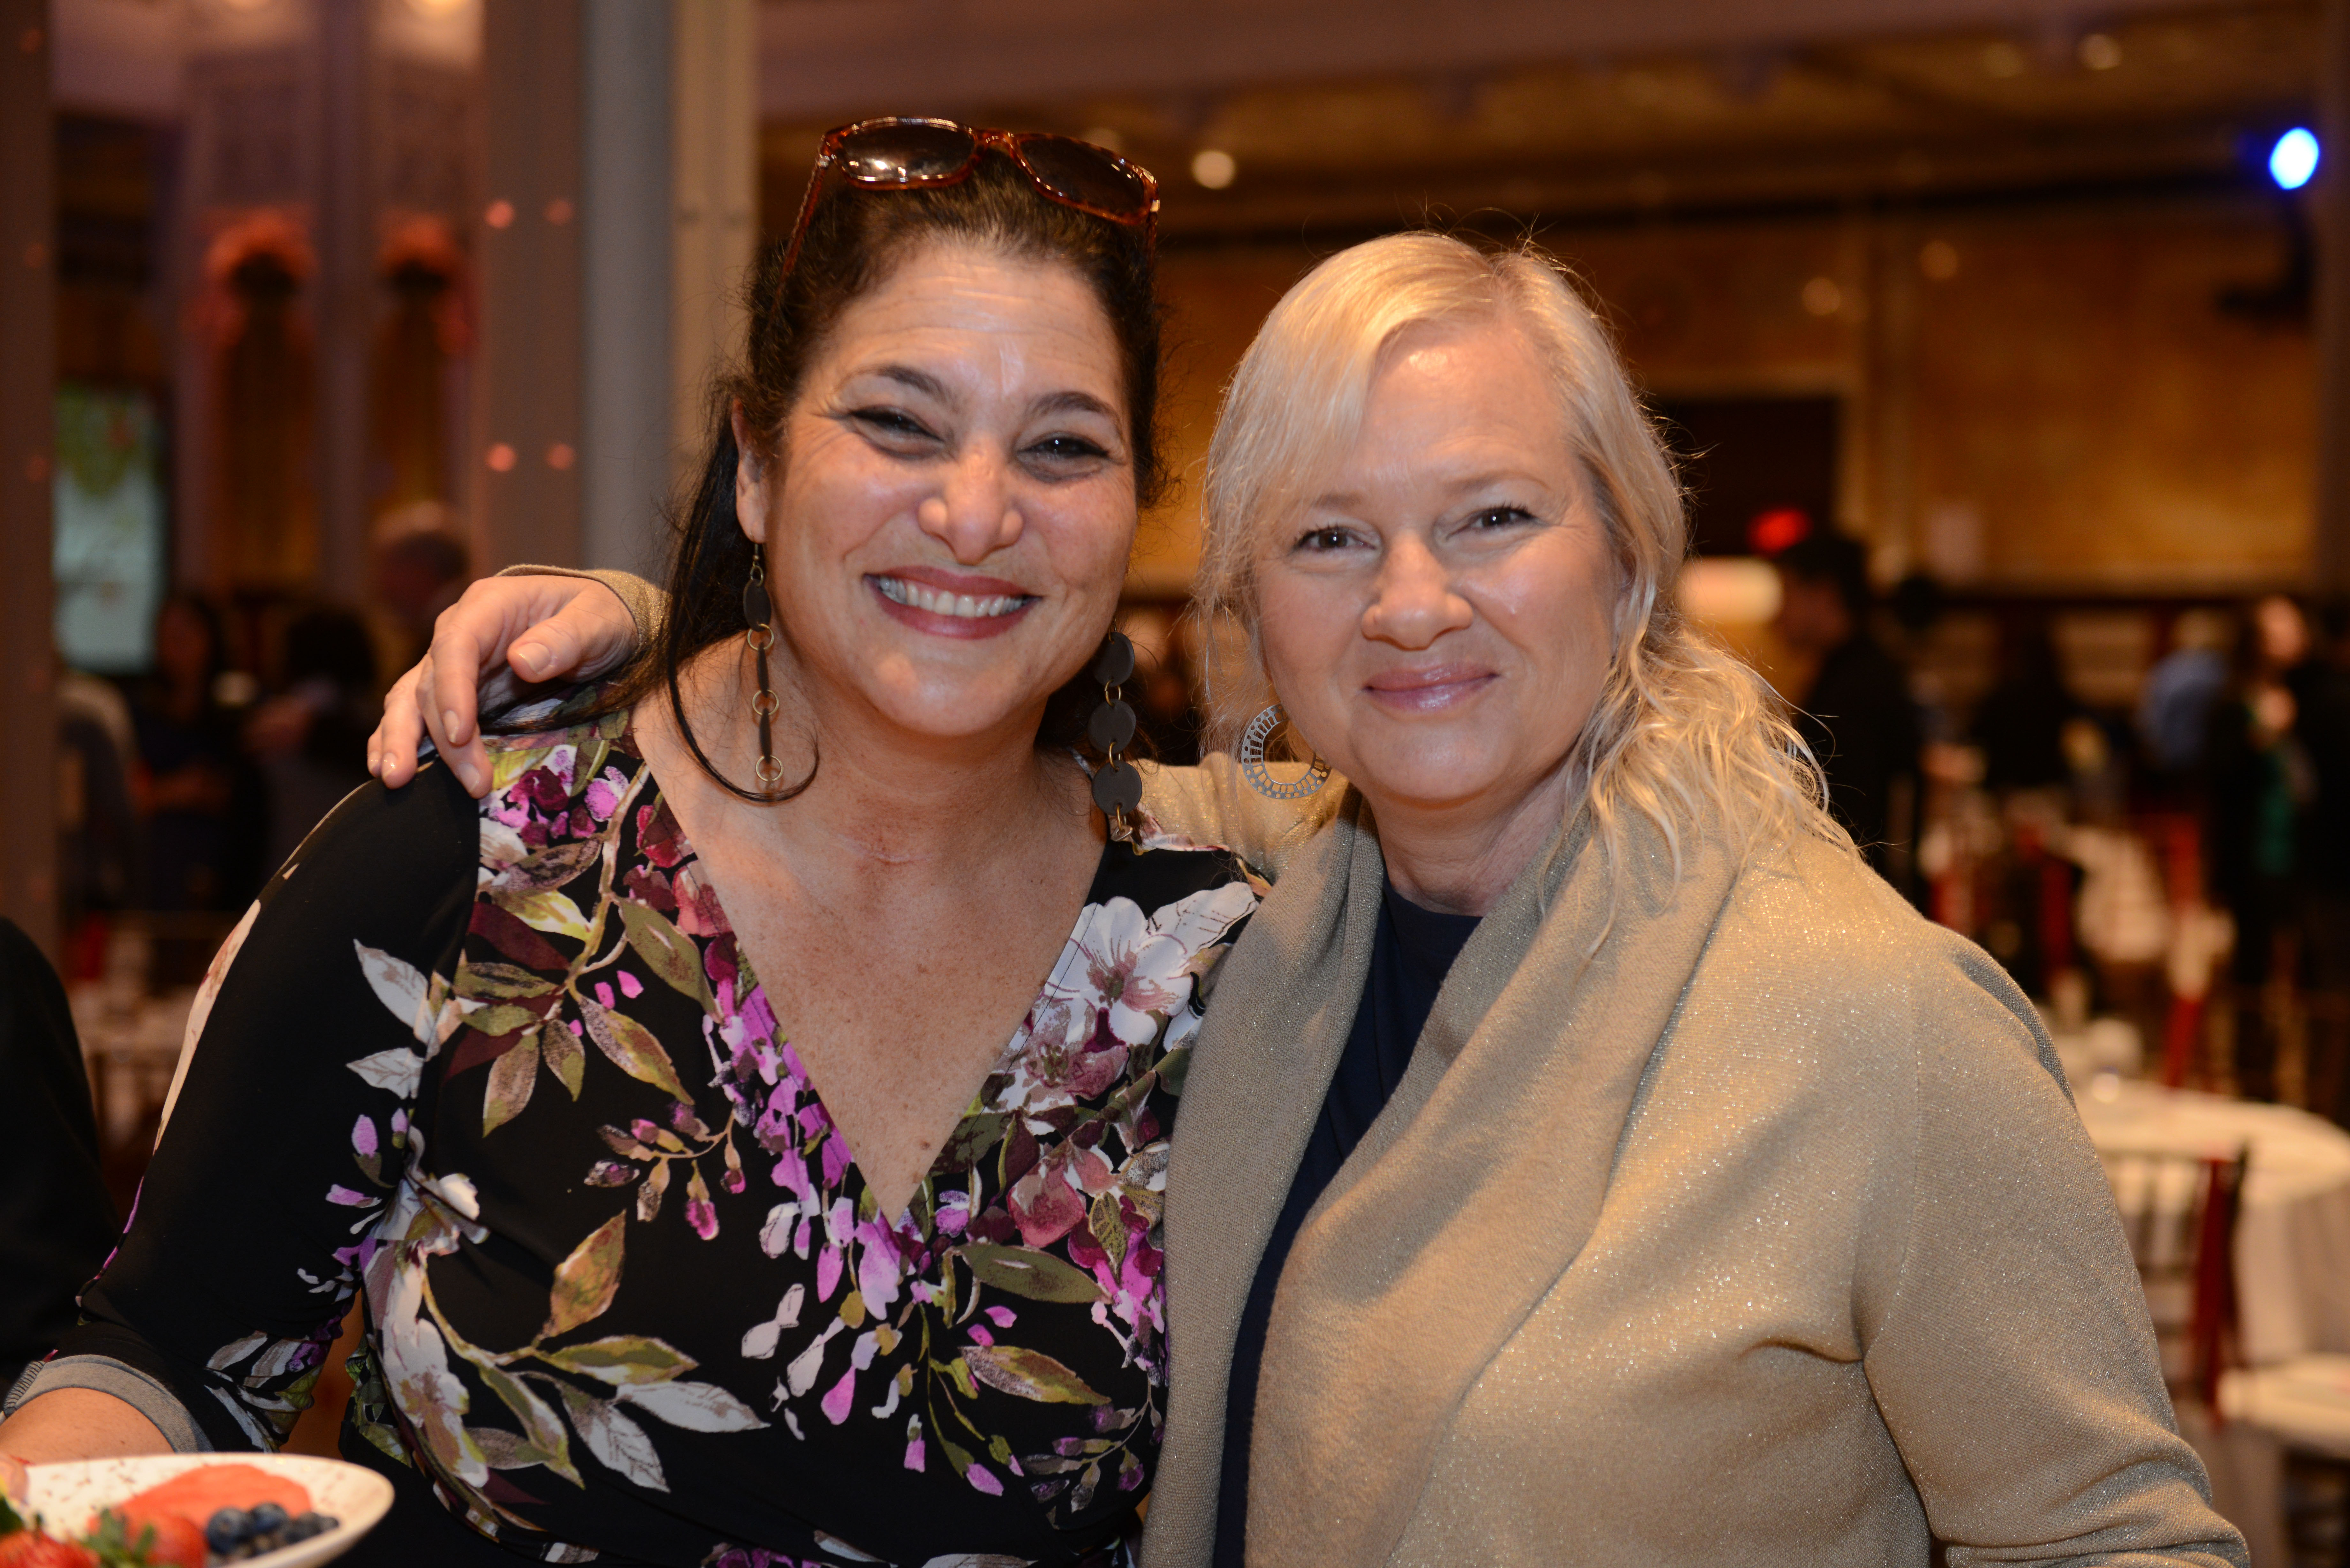 2018 Covenant Award Recipient Naomi Ackerman and 2012 Covenant Award Recipient Karina Zilberman.